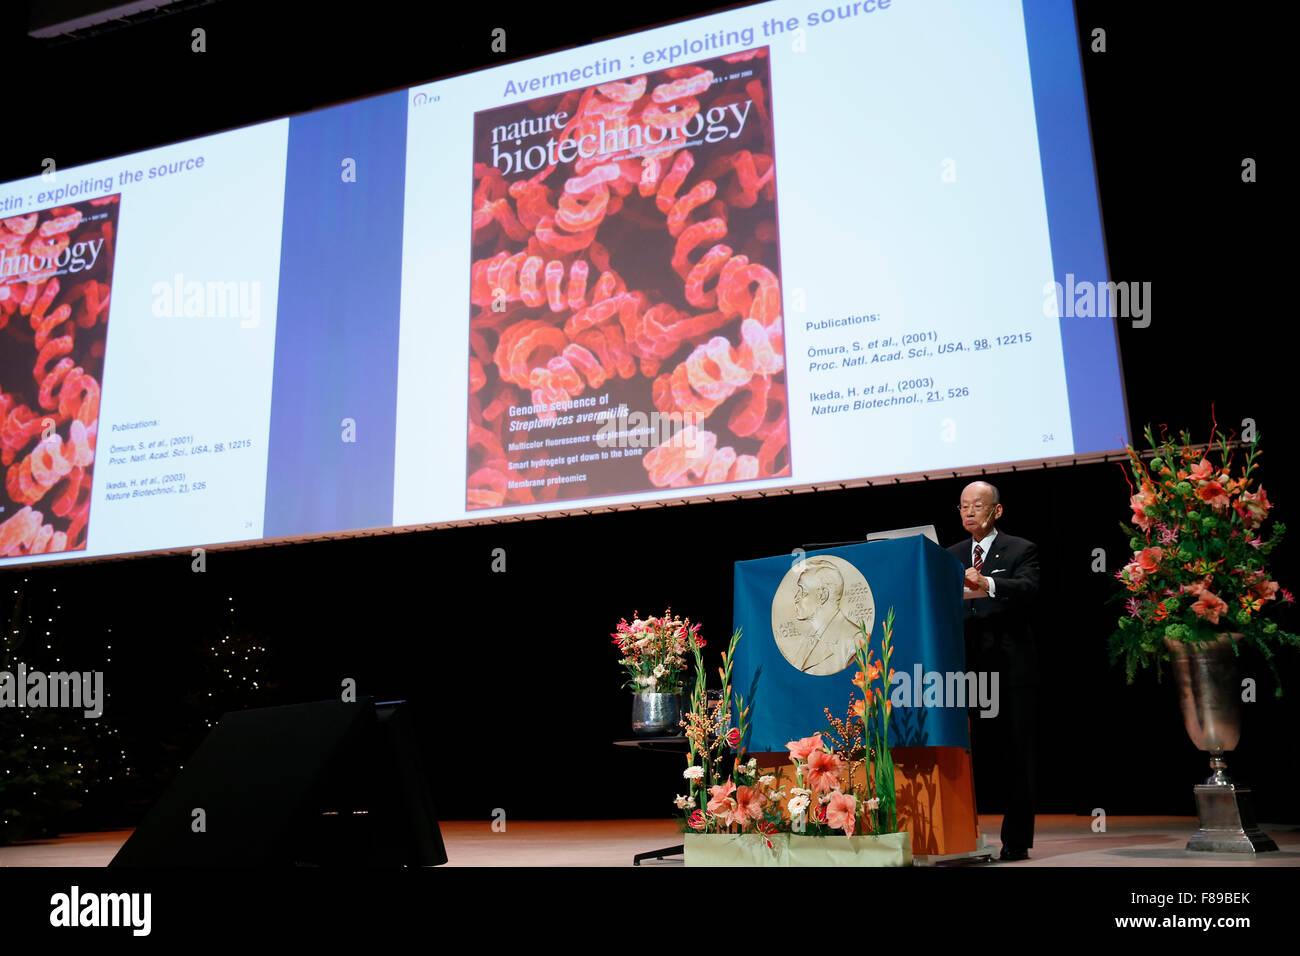 Stockholm, Sweden. 7th Dec, 2015. The 2015 Nobel Prize laureate for Physiology or Medicine Satoshi Omura addresses Stock Photo